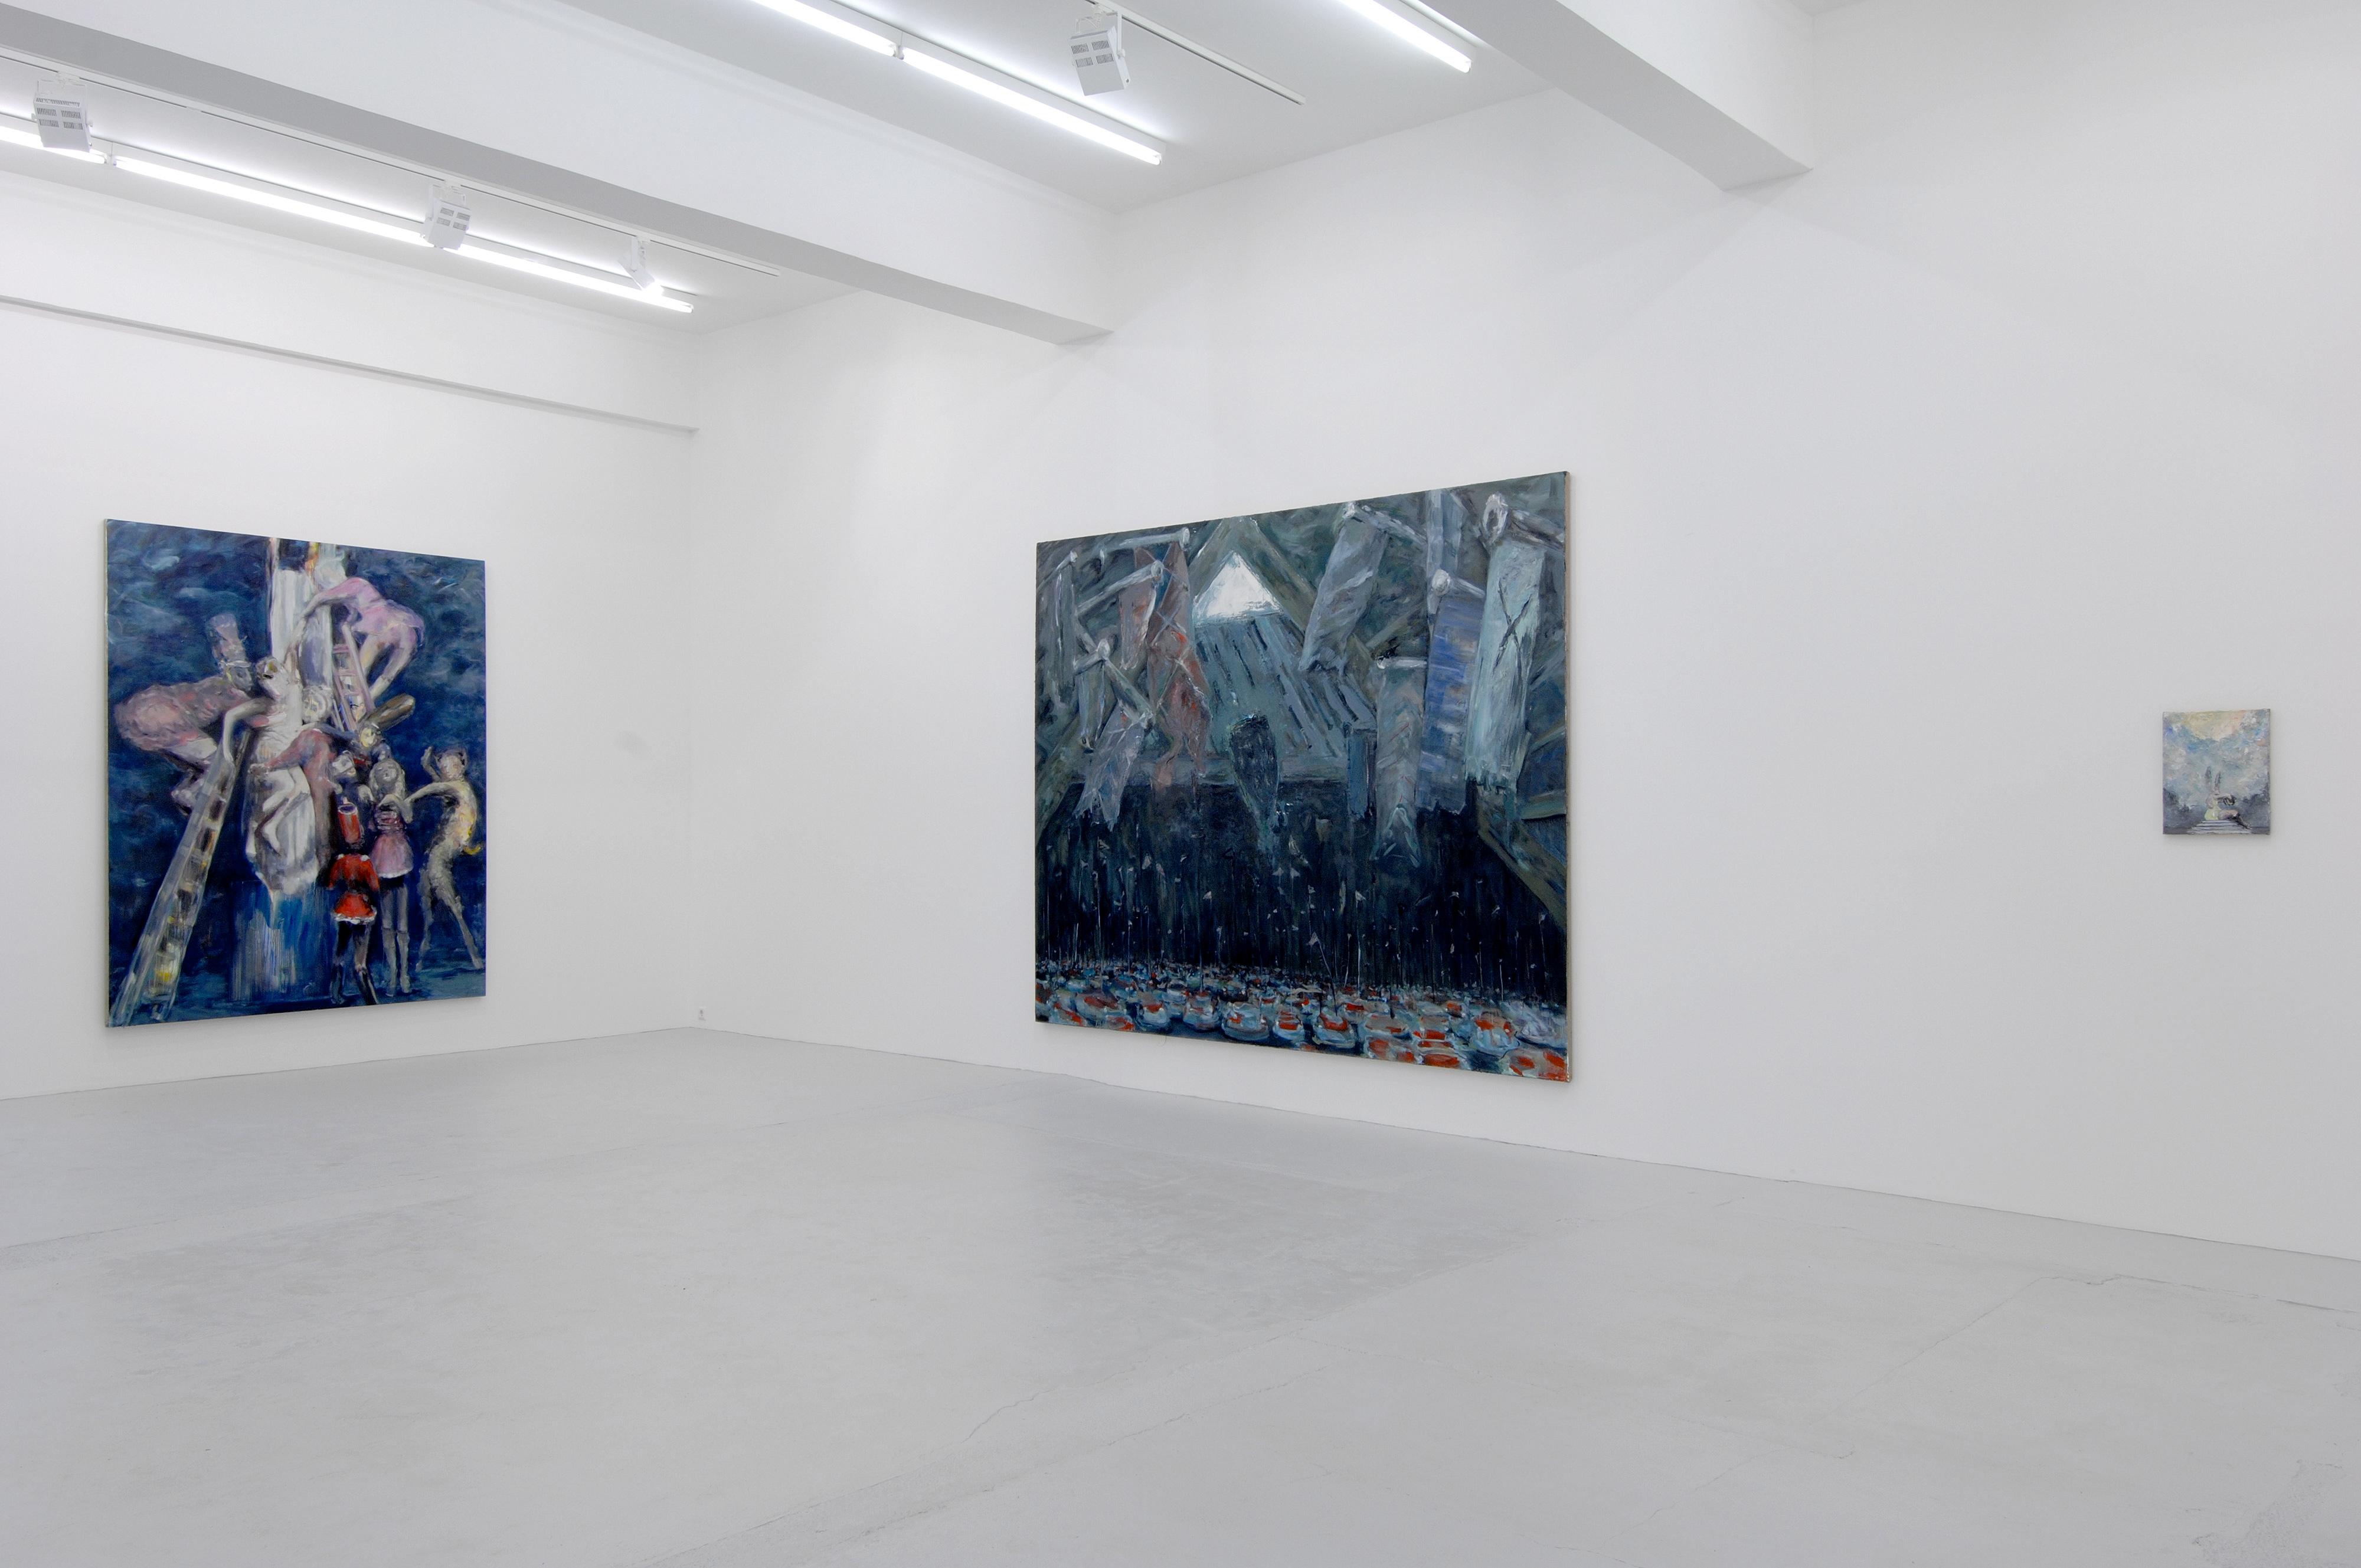 Galerie Barbara Thumm \ Valérie Favre – Honig in der Sackgasse